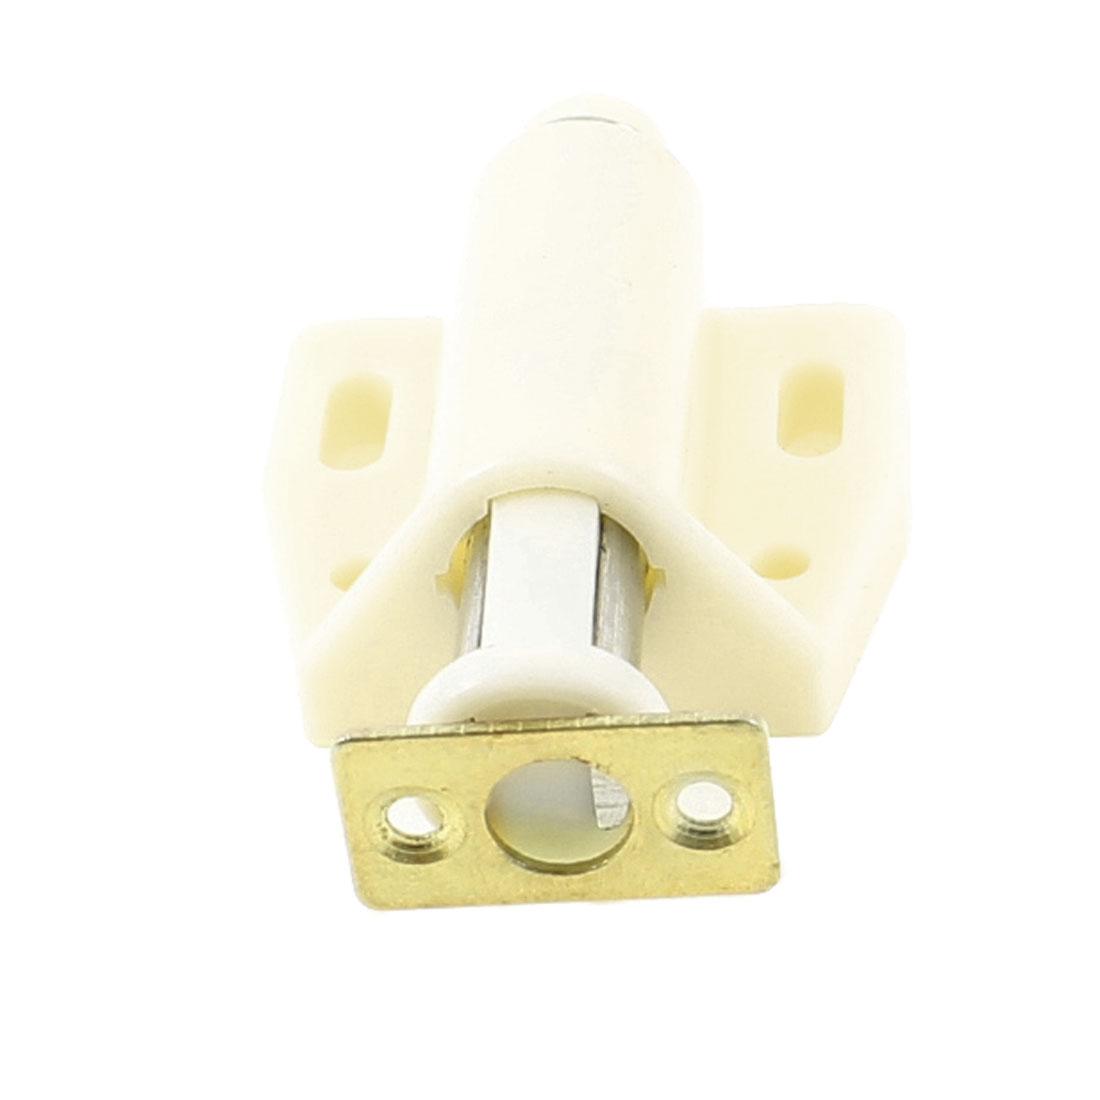 3.8cm Width Single Touch Press Door Magnetic Catch Latch Beige